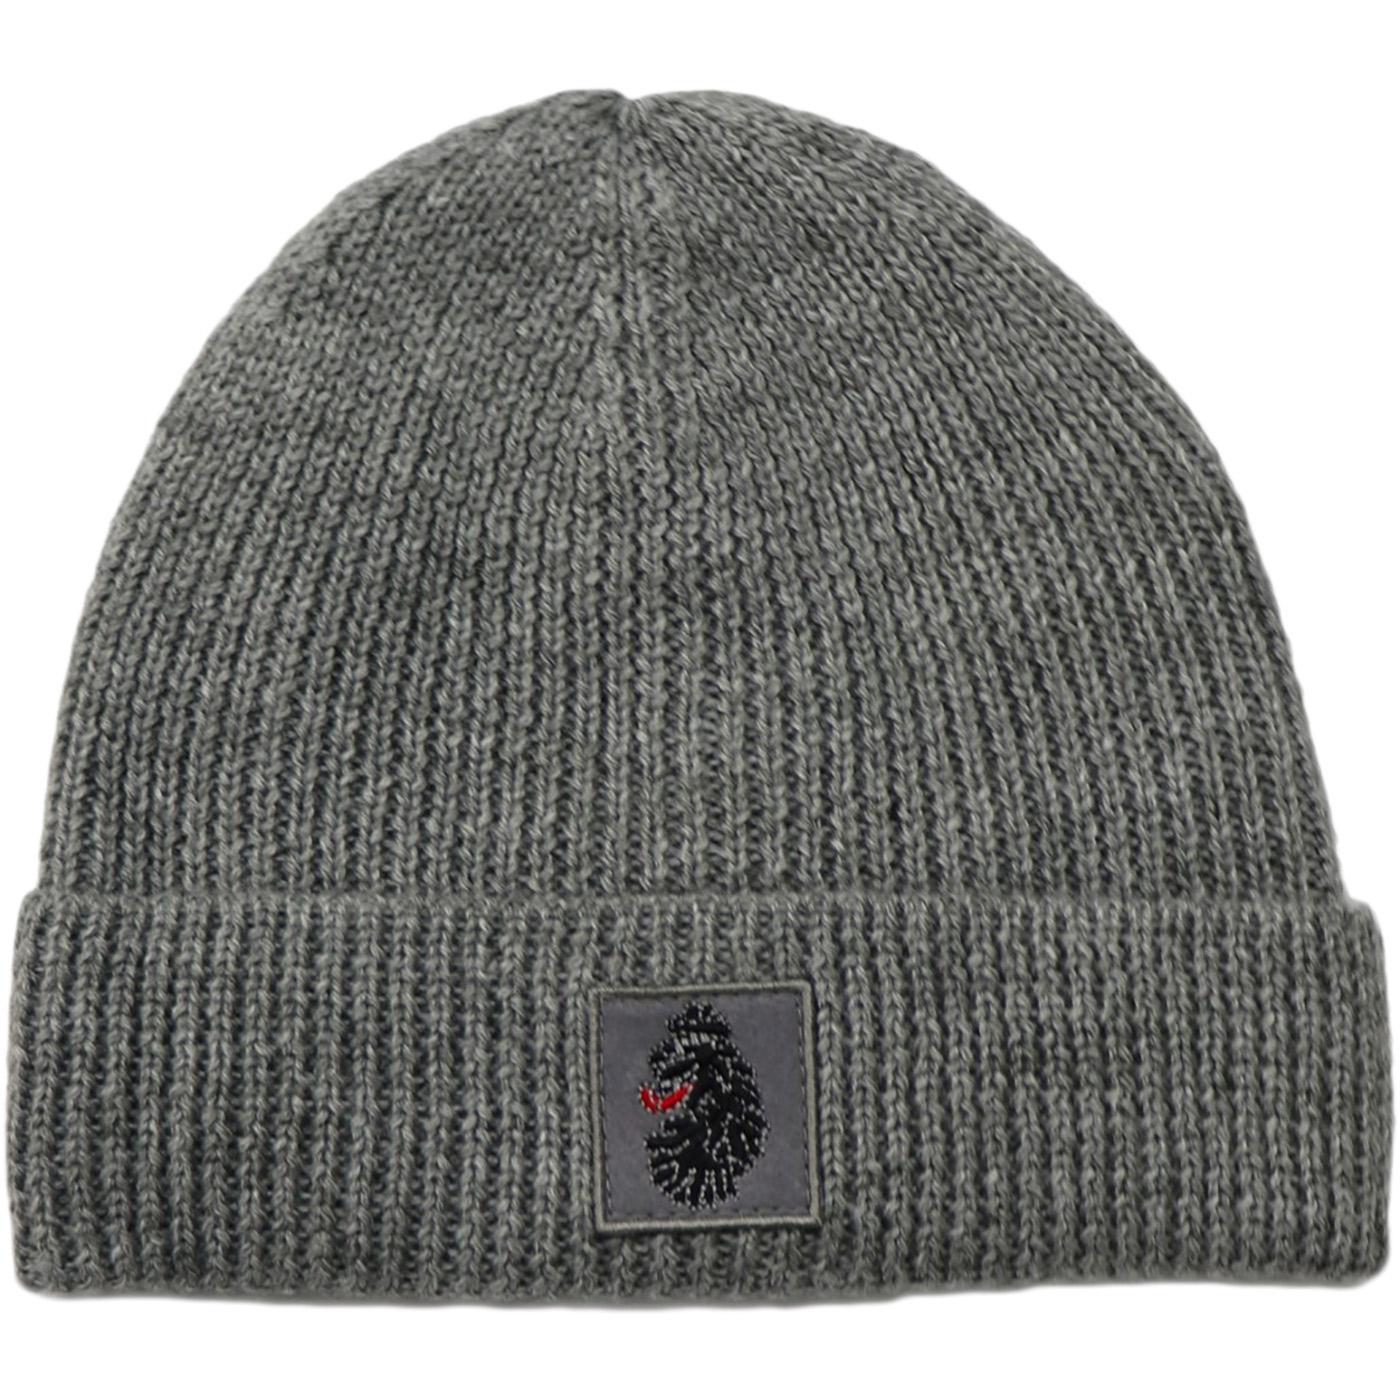 Nash LUKE Retro Knitted Cuffed Beanie Hat (Grey)